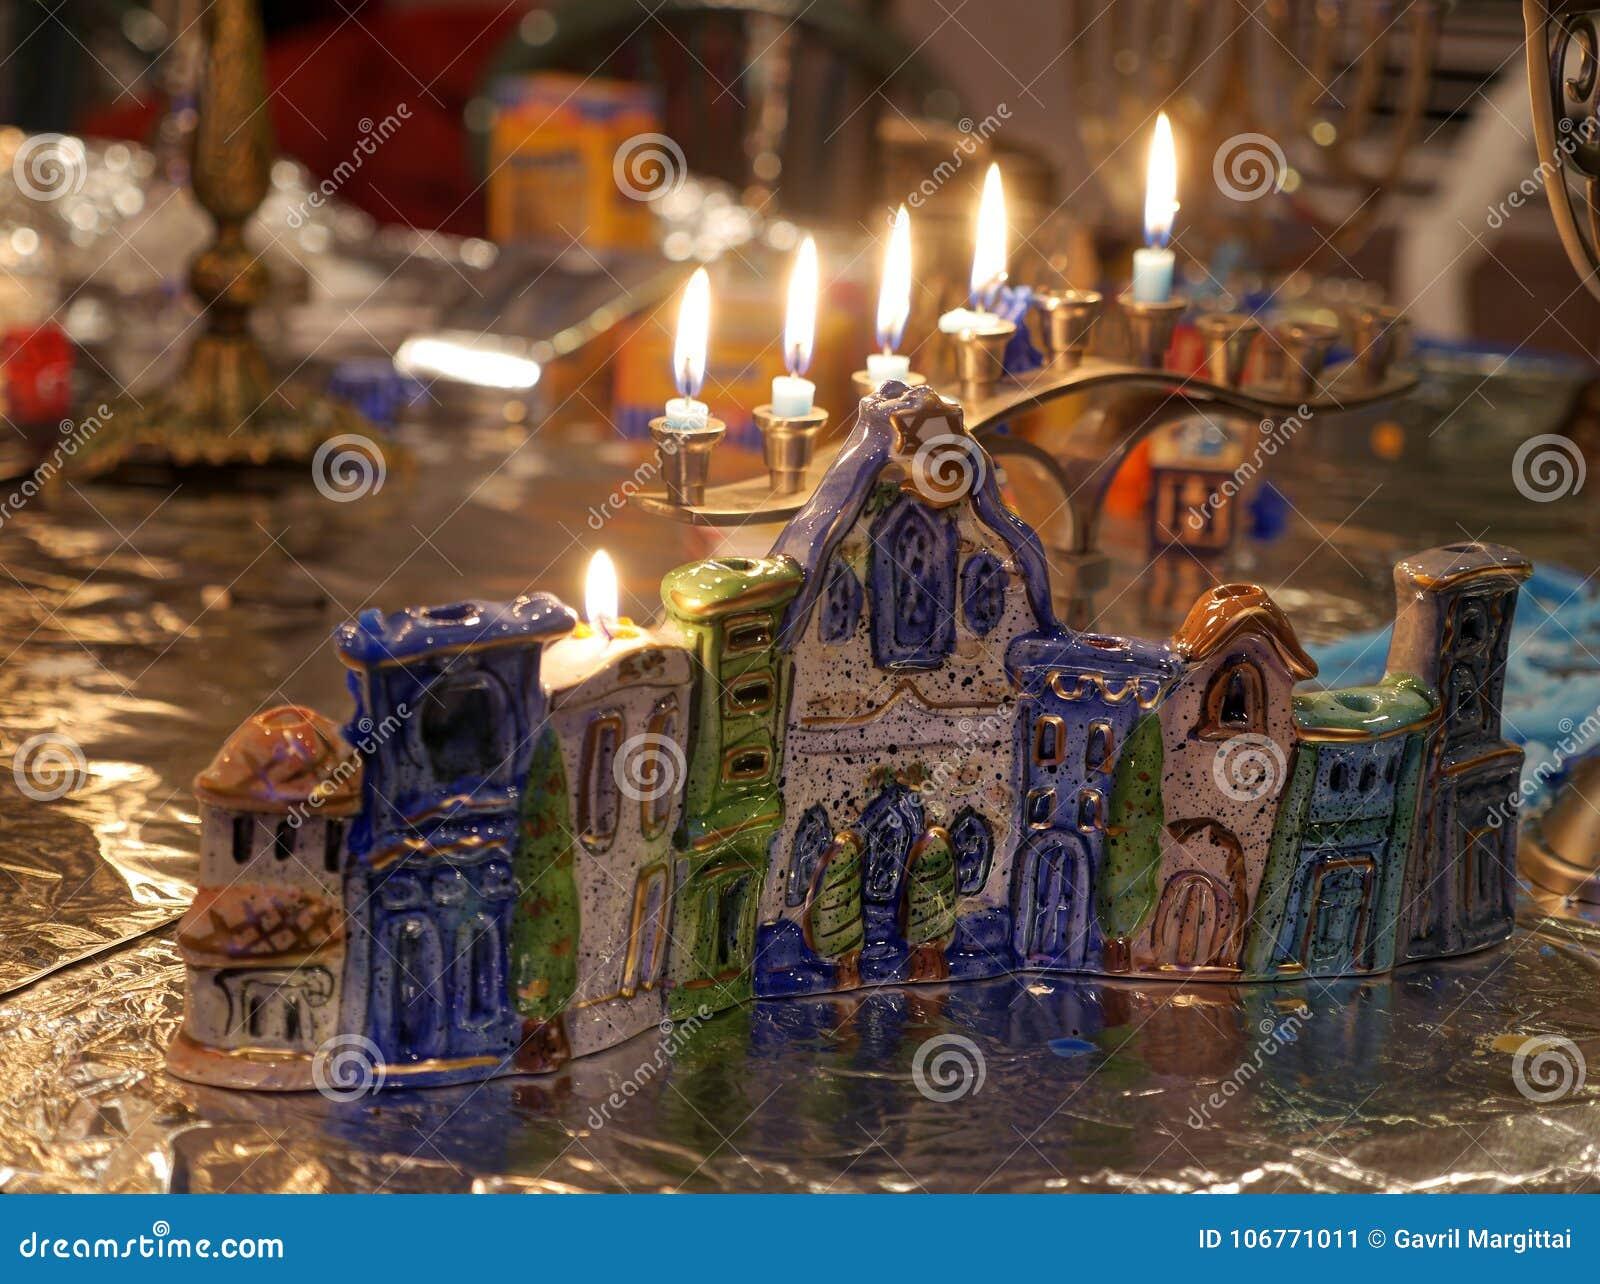 Hanuka candle lights